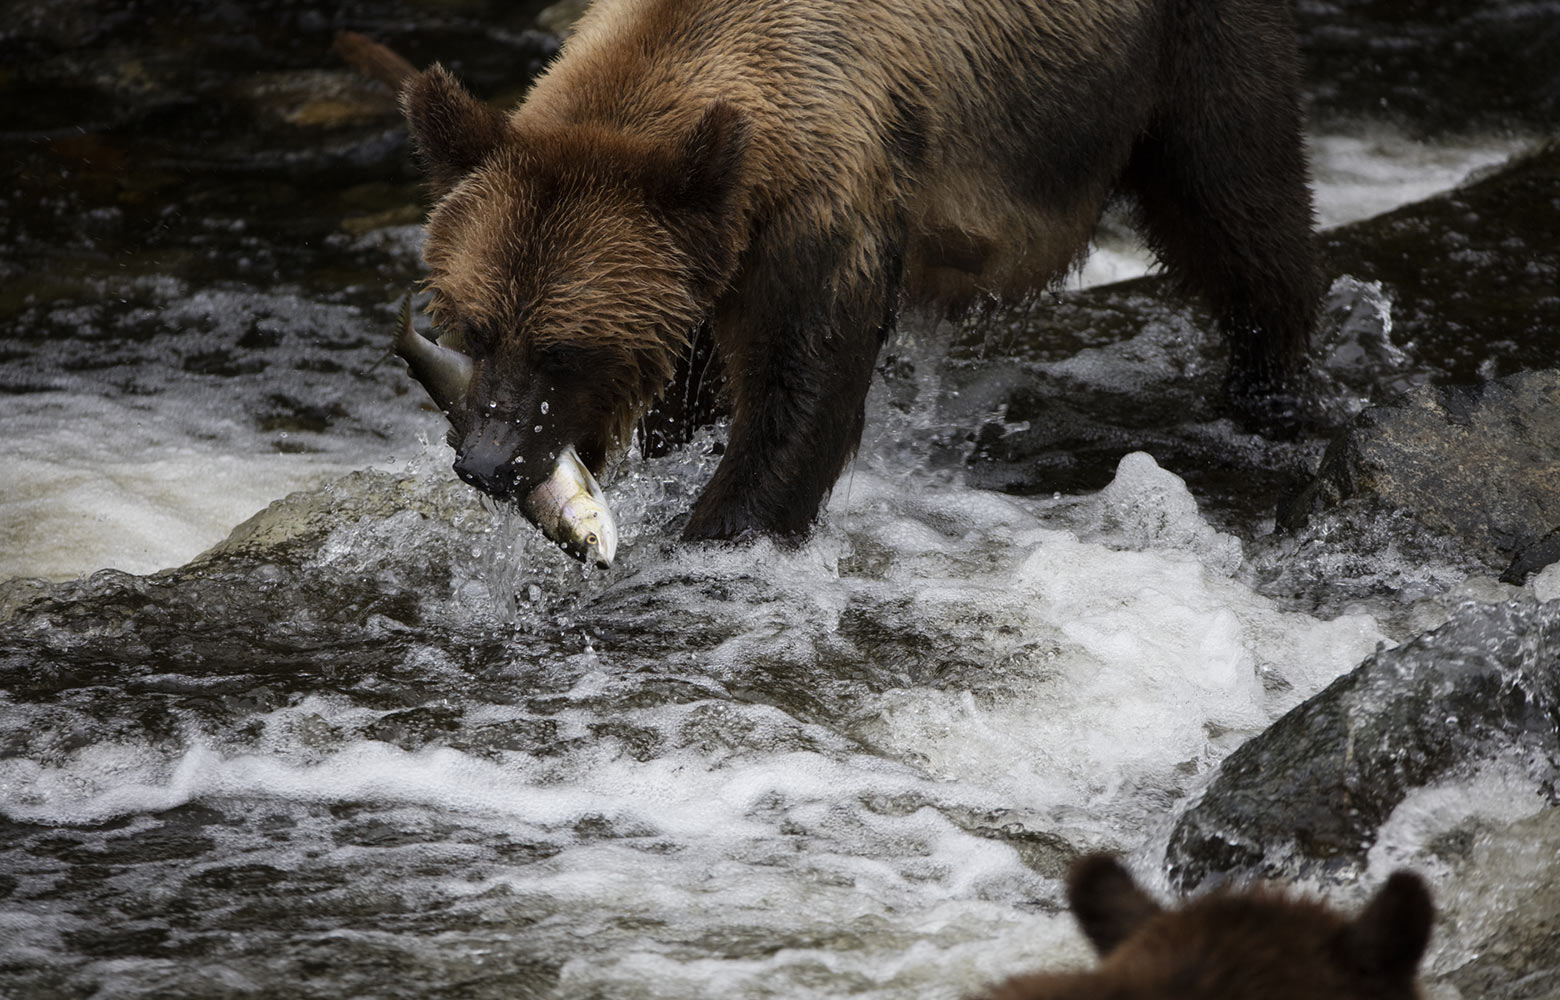 Salmon Secondary bear